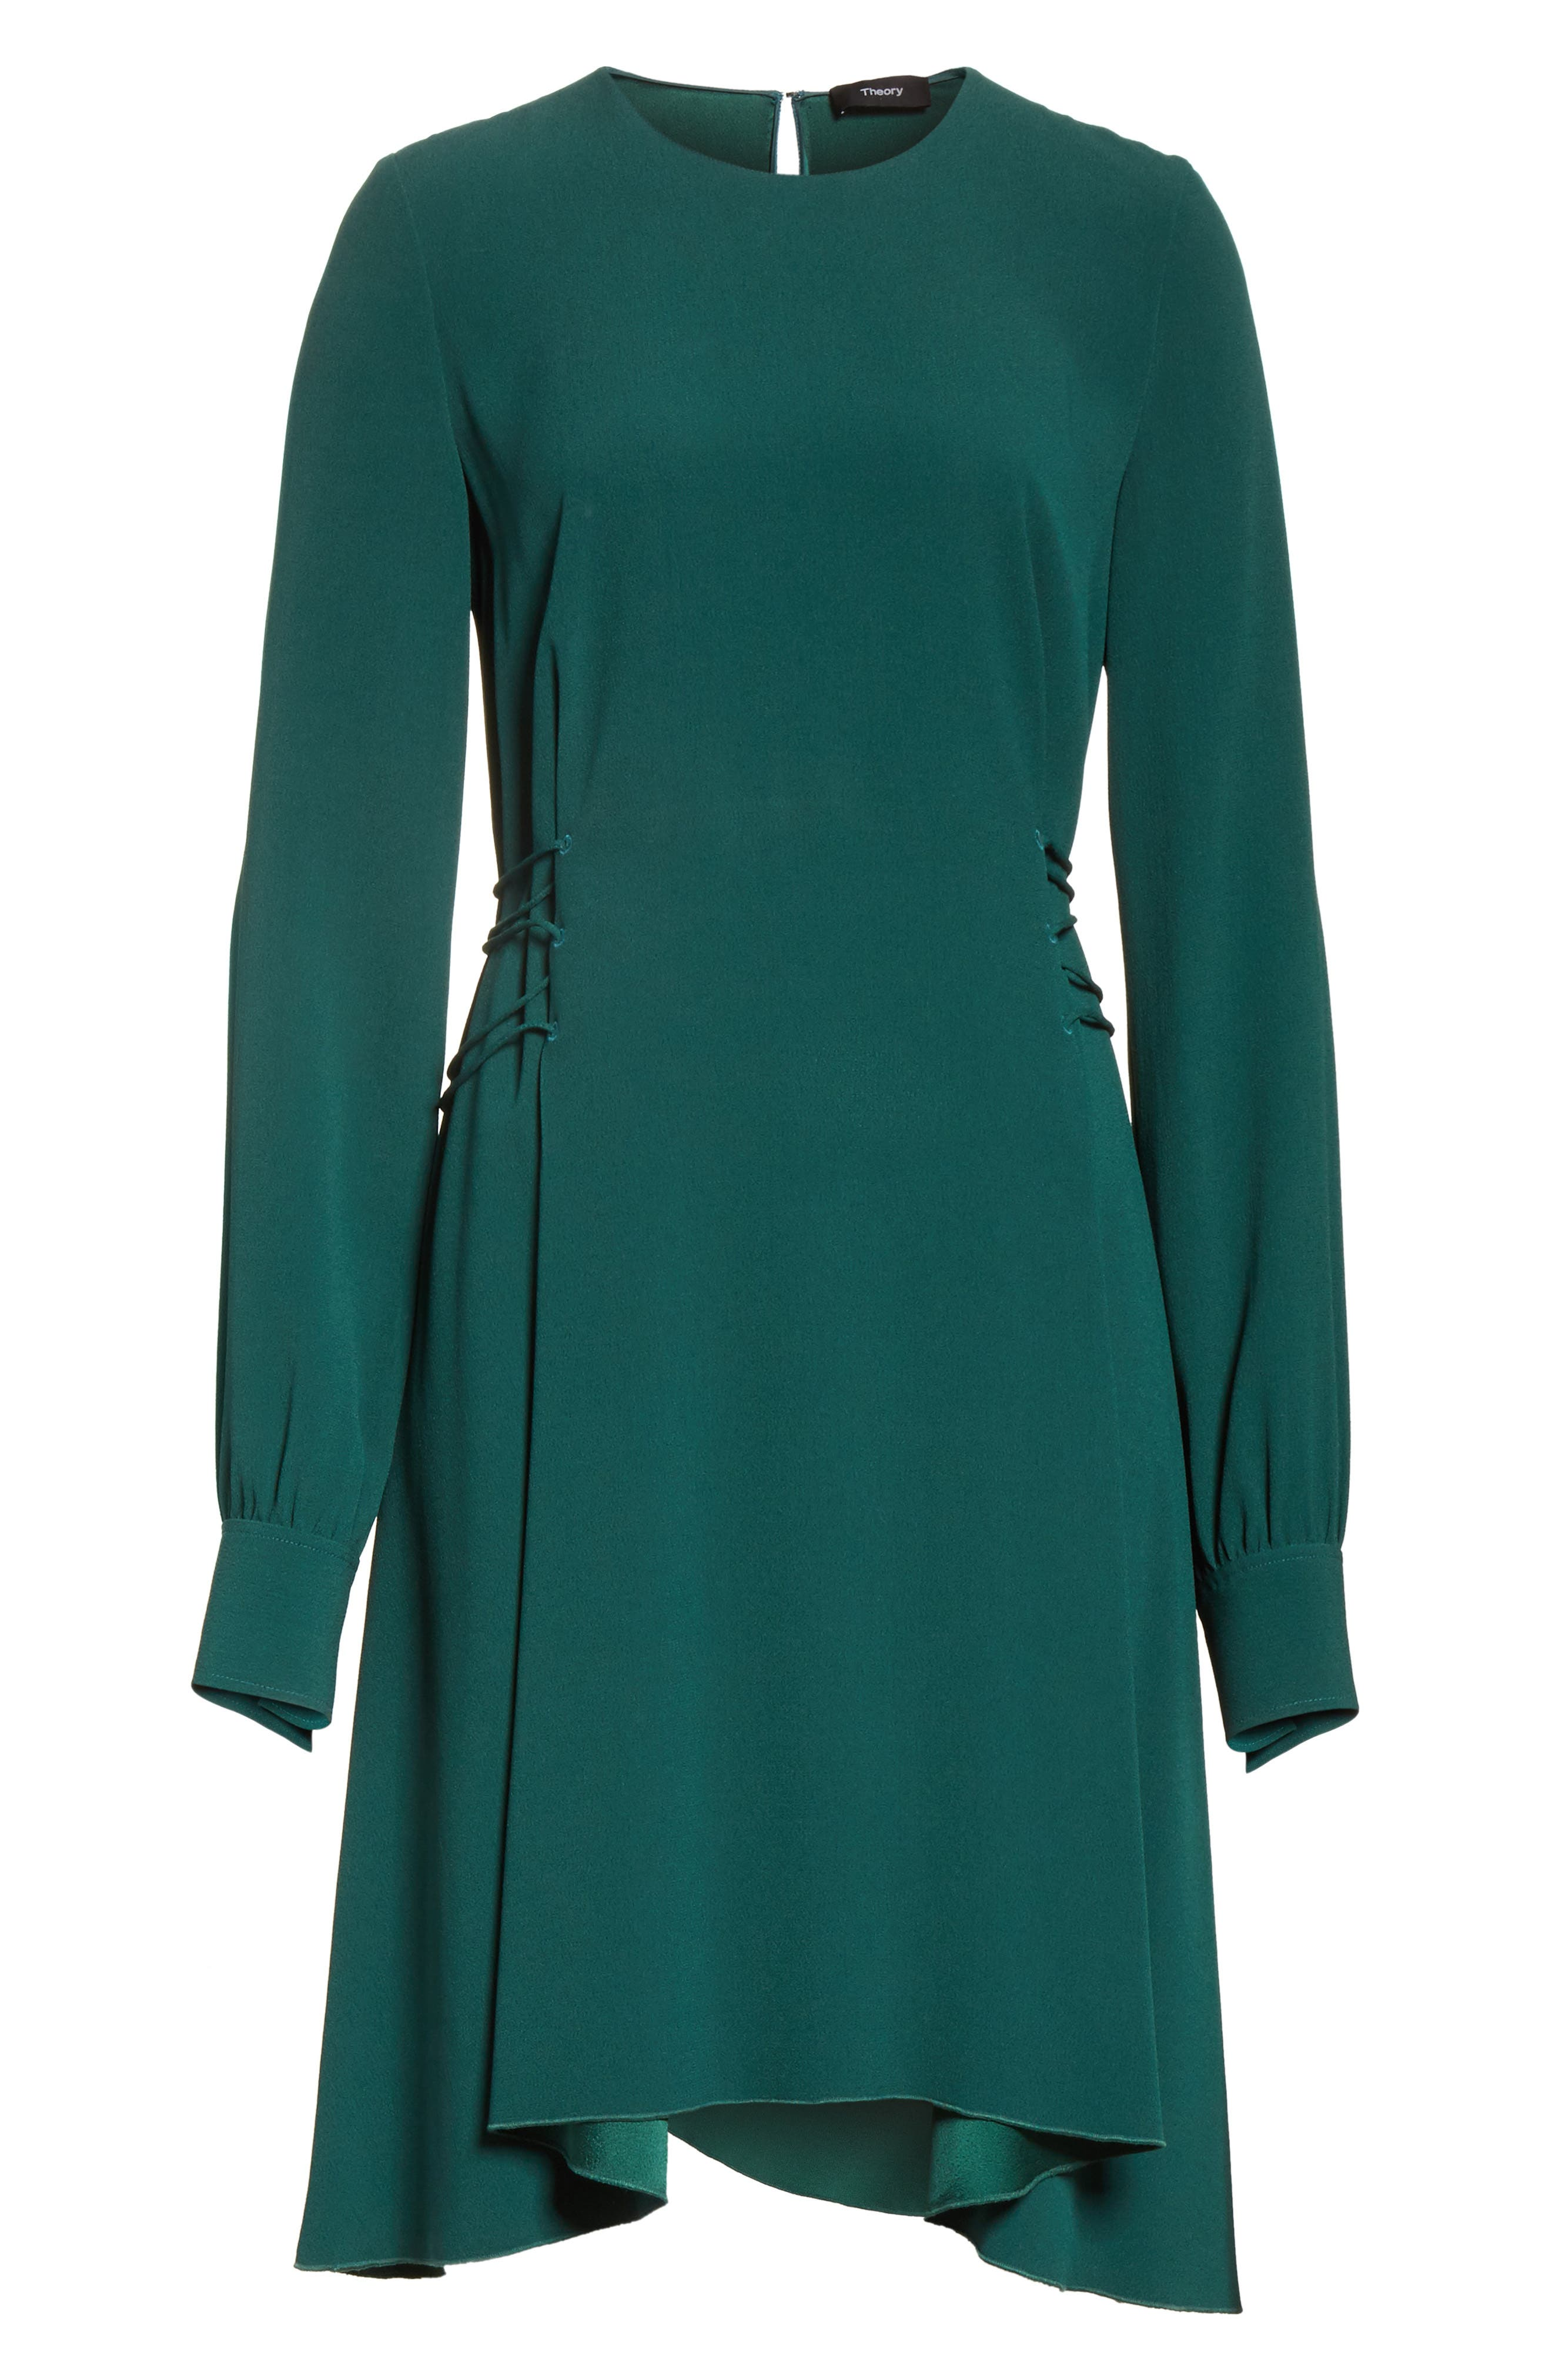 Kensington Lace-Up A-Line Dress,                             Alternate thumbnail 6, color,                             Bright Hunter